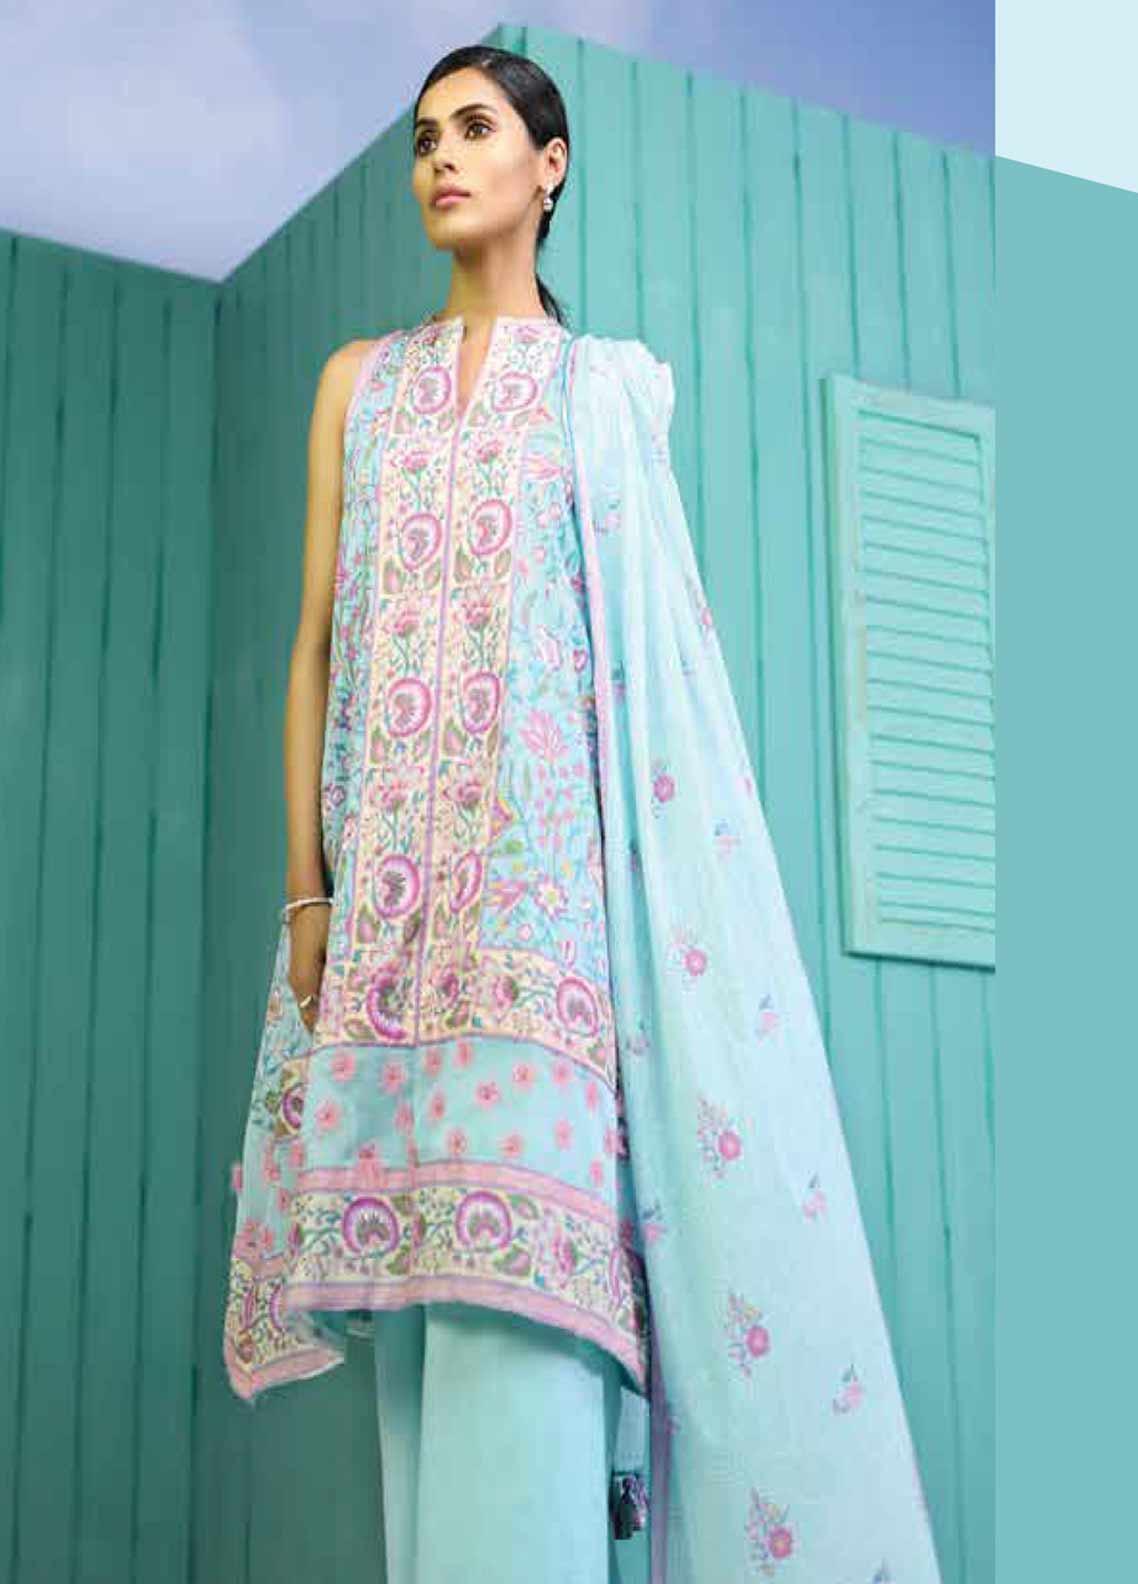 Al Karam Printed Lawn Unstitched 3 Piece Suit AK19-L2 7.1 BLUE - Spring / Summer Collection